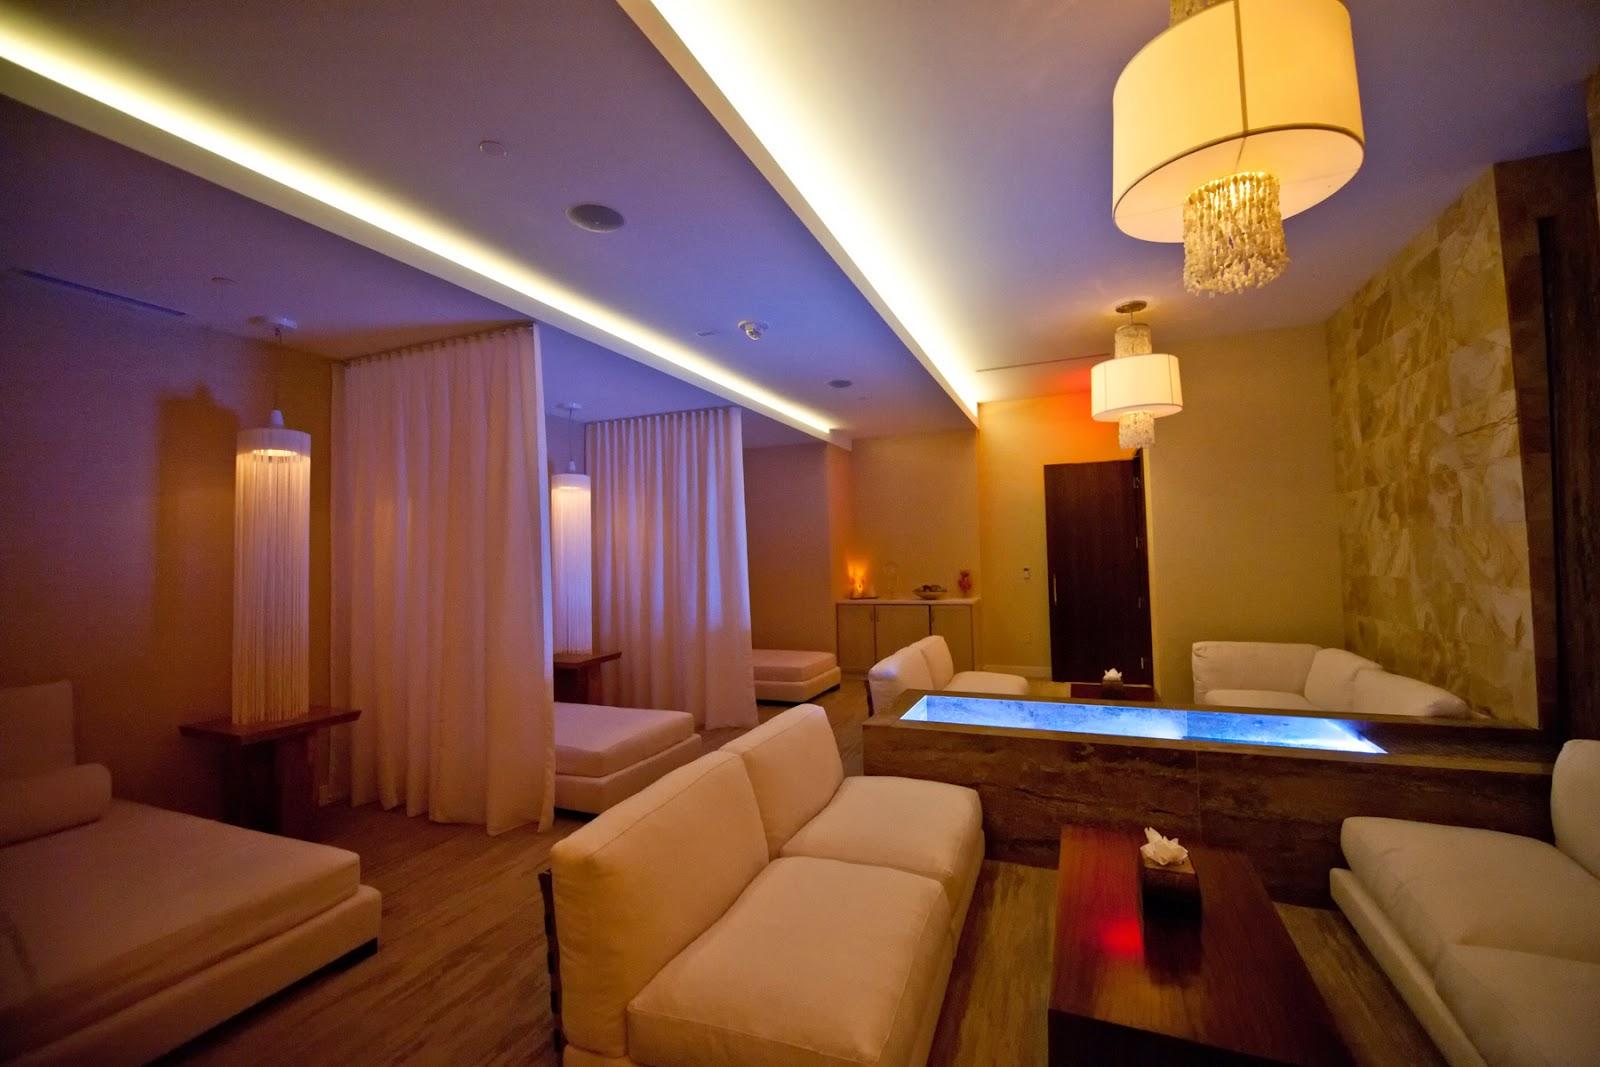 Ảnh Spa - Massage Full HD tuyệt đẹp, Images Massage